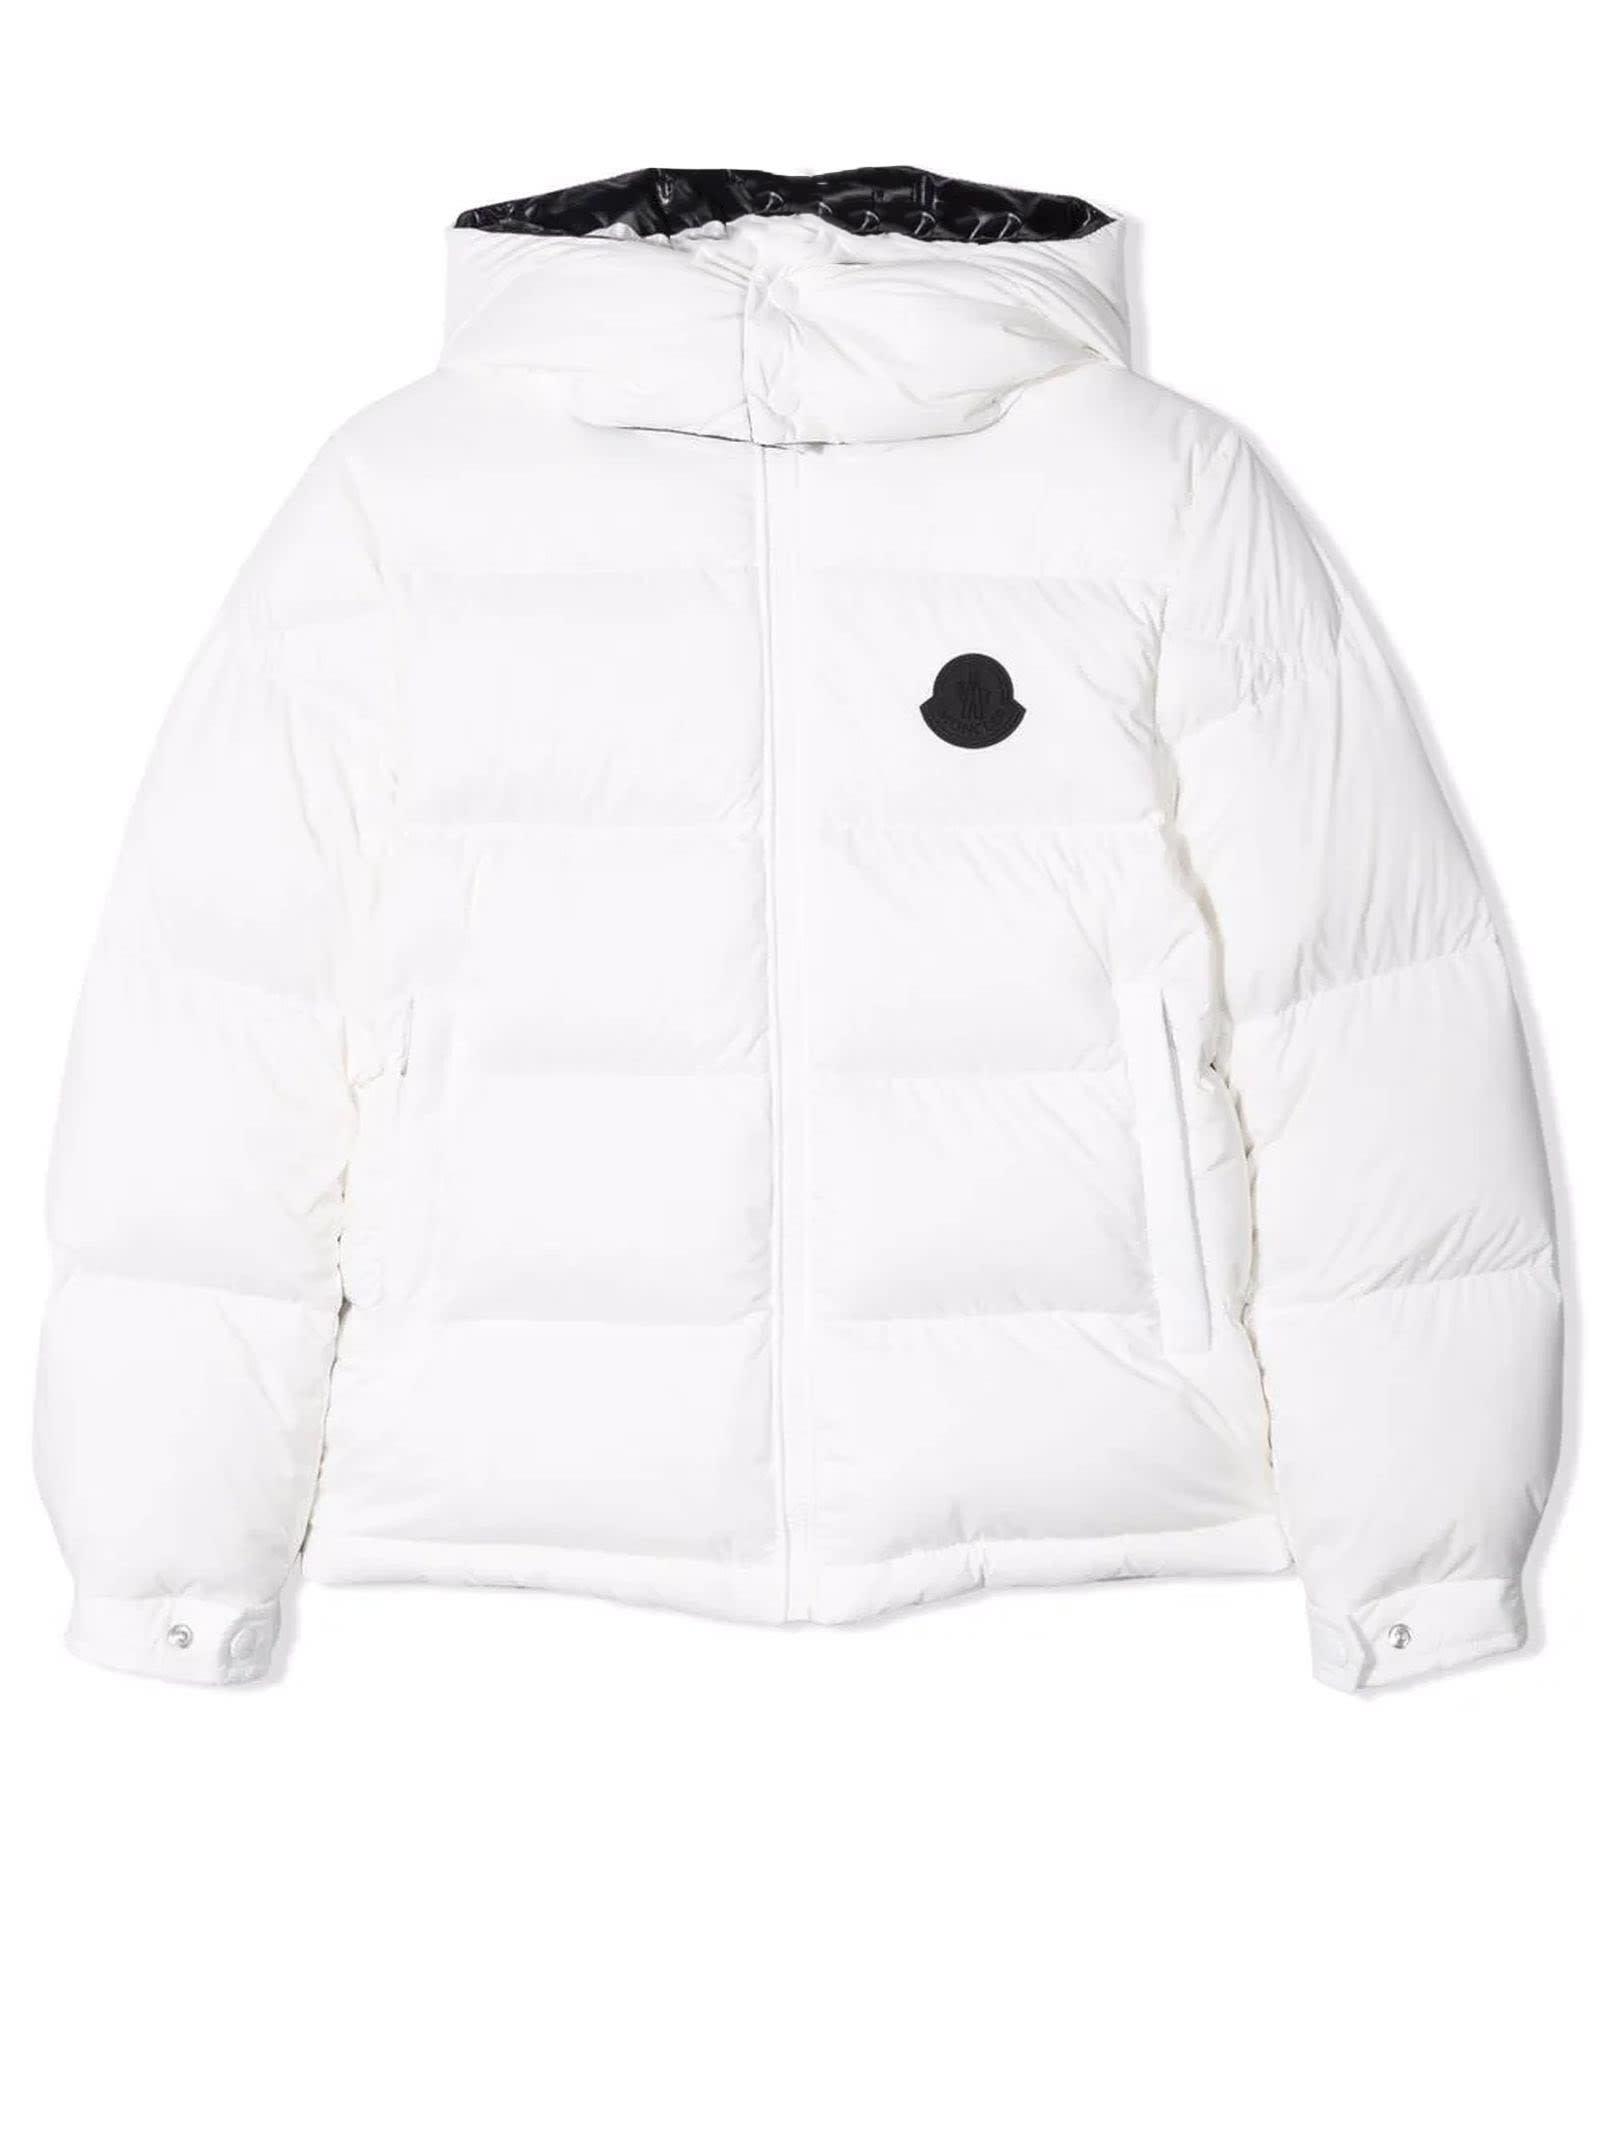 Moncler White Ercan Jacket